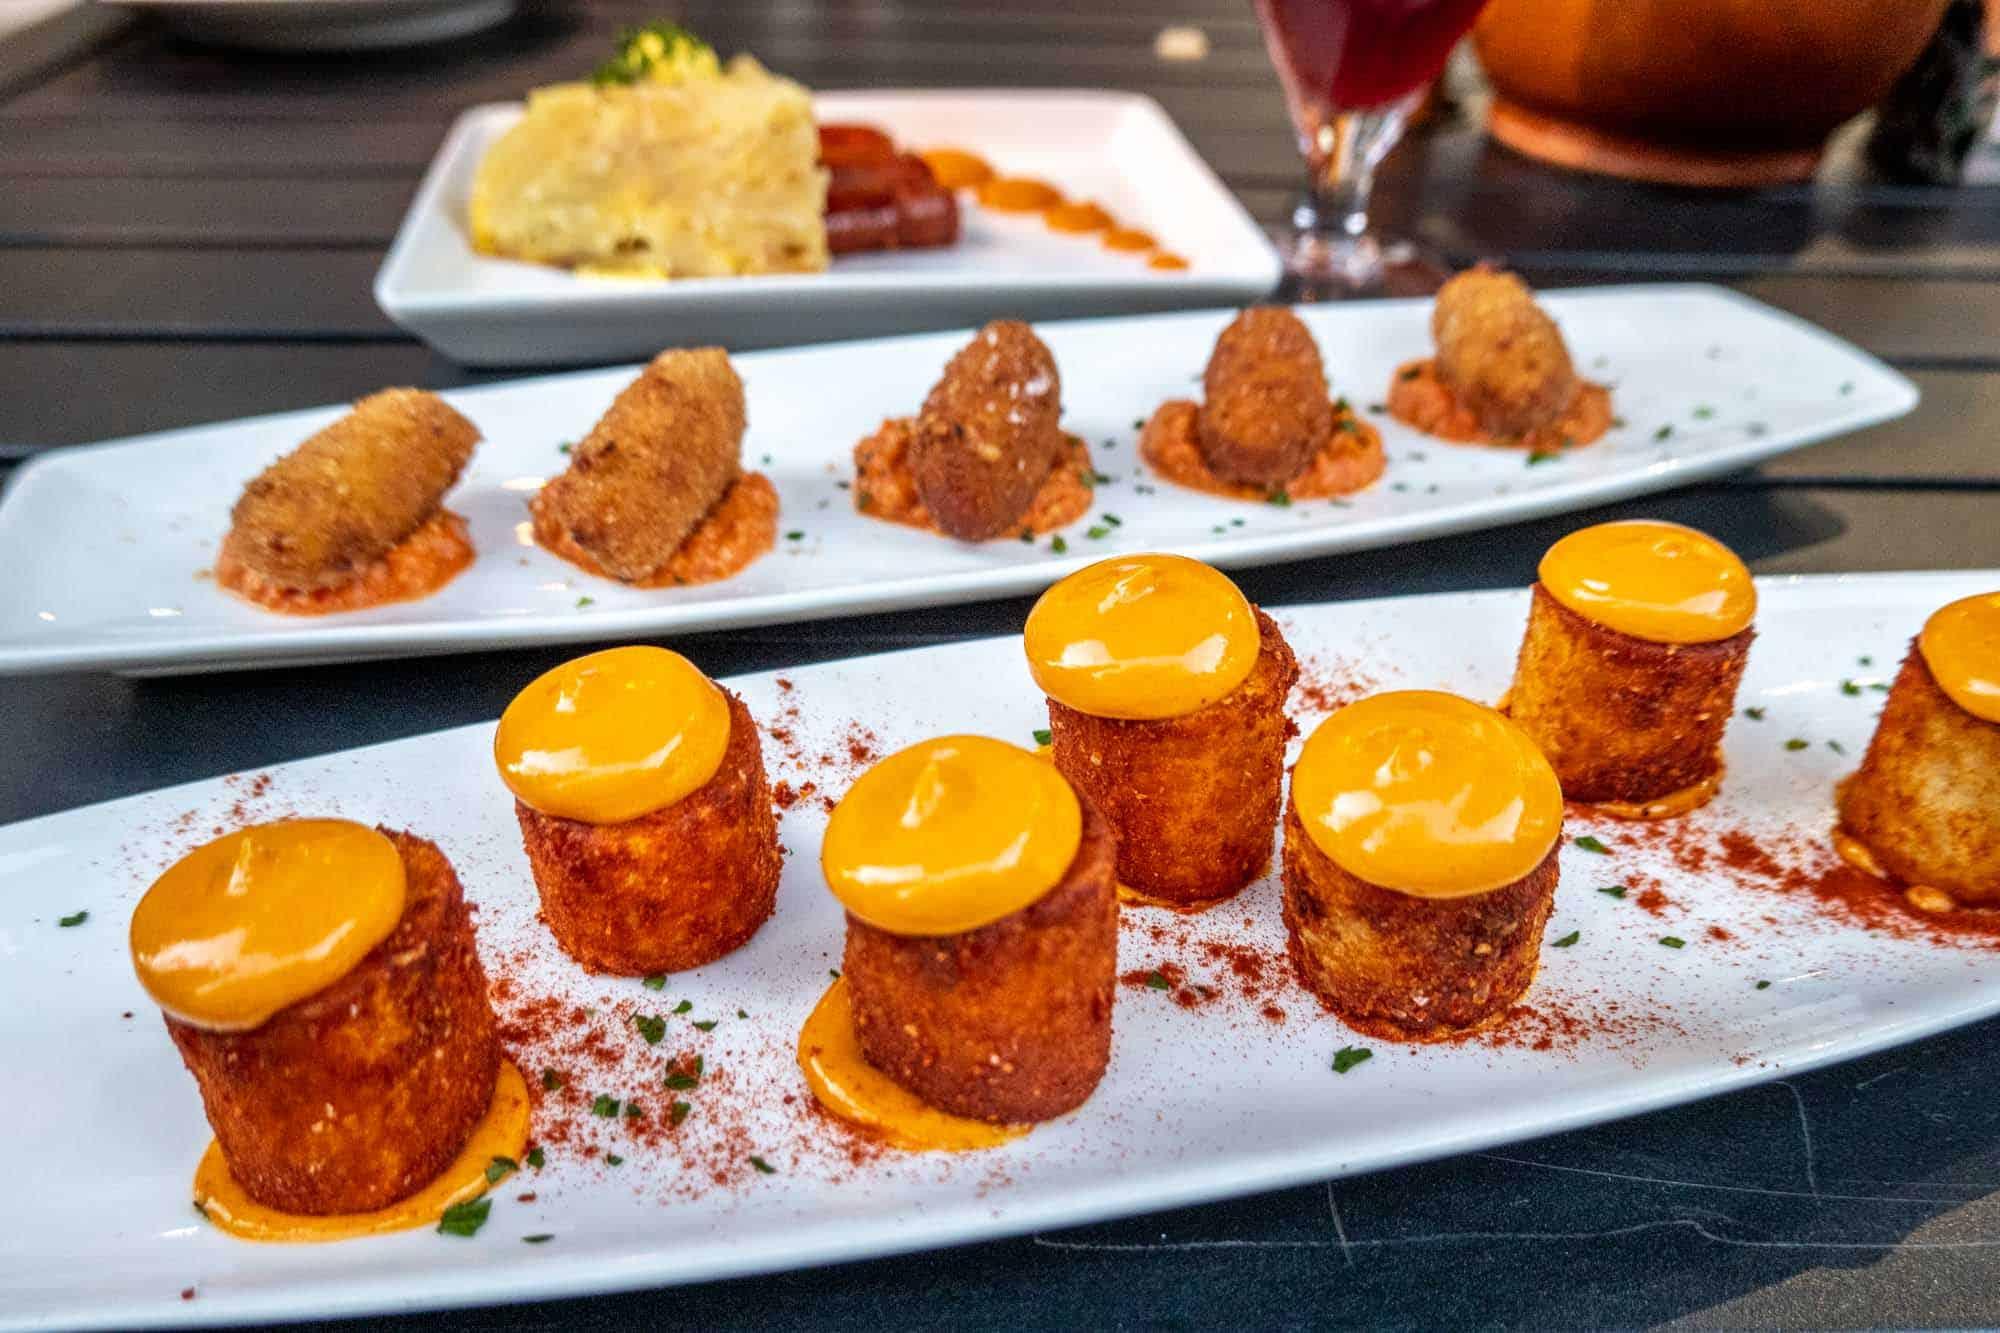 Marshmallow-shaped potatoes on plate